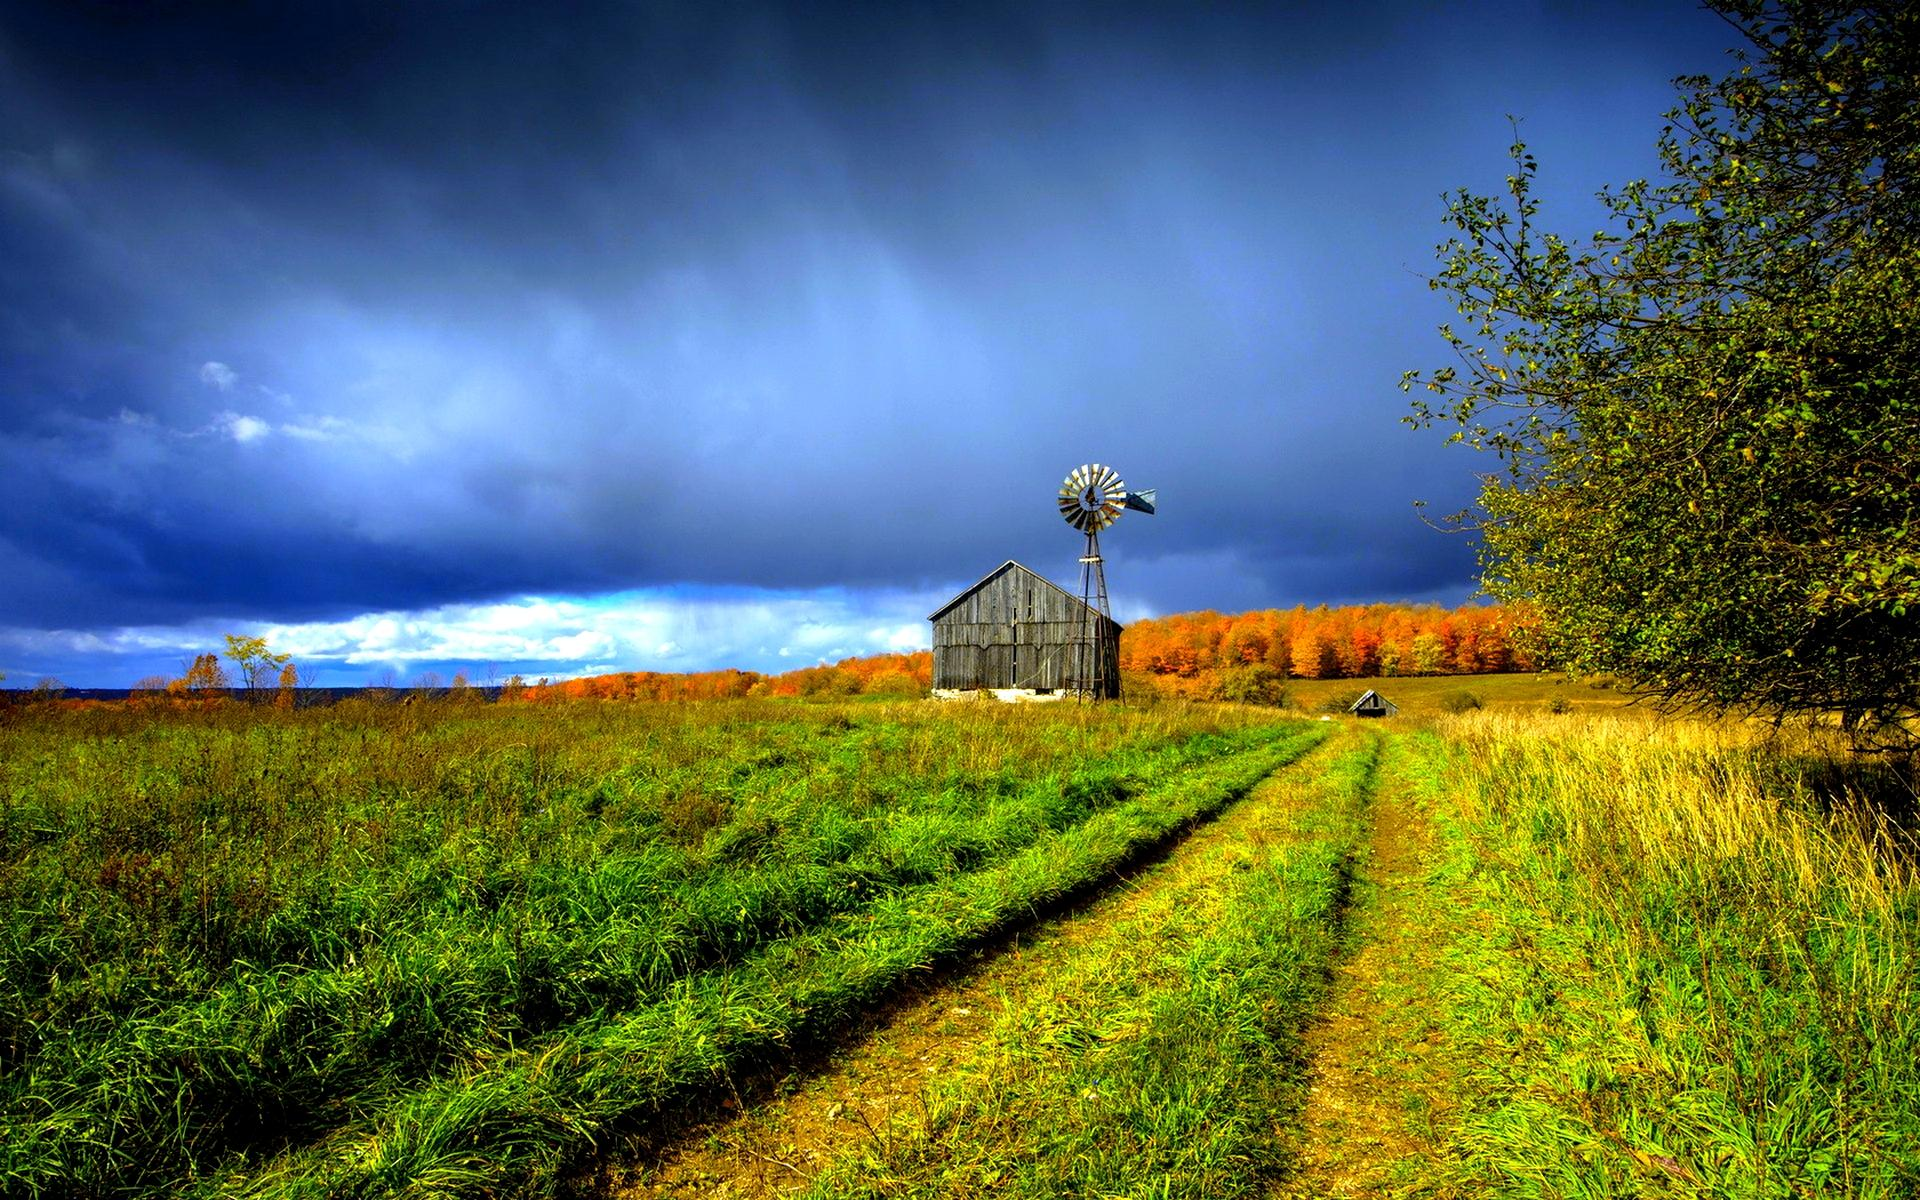 country winter scenes wallpaper